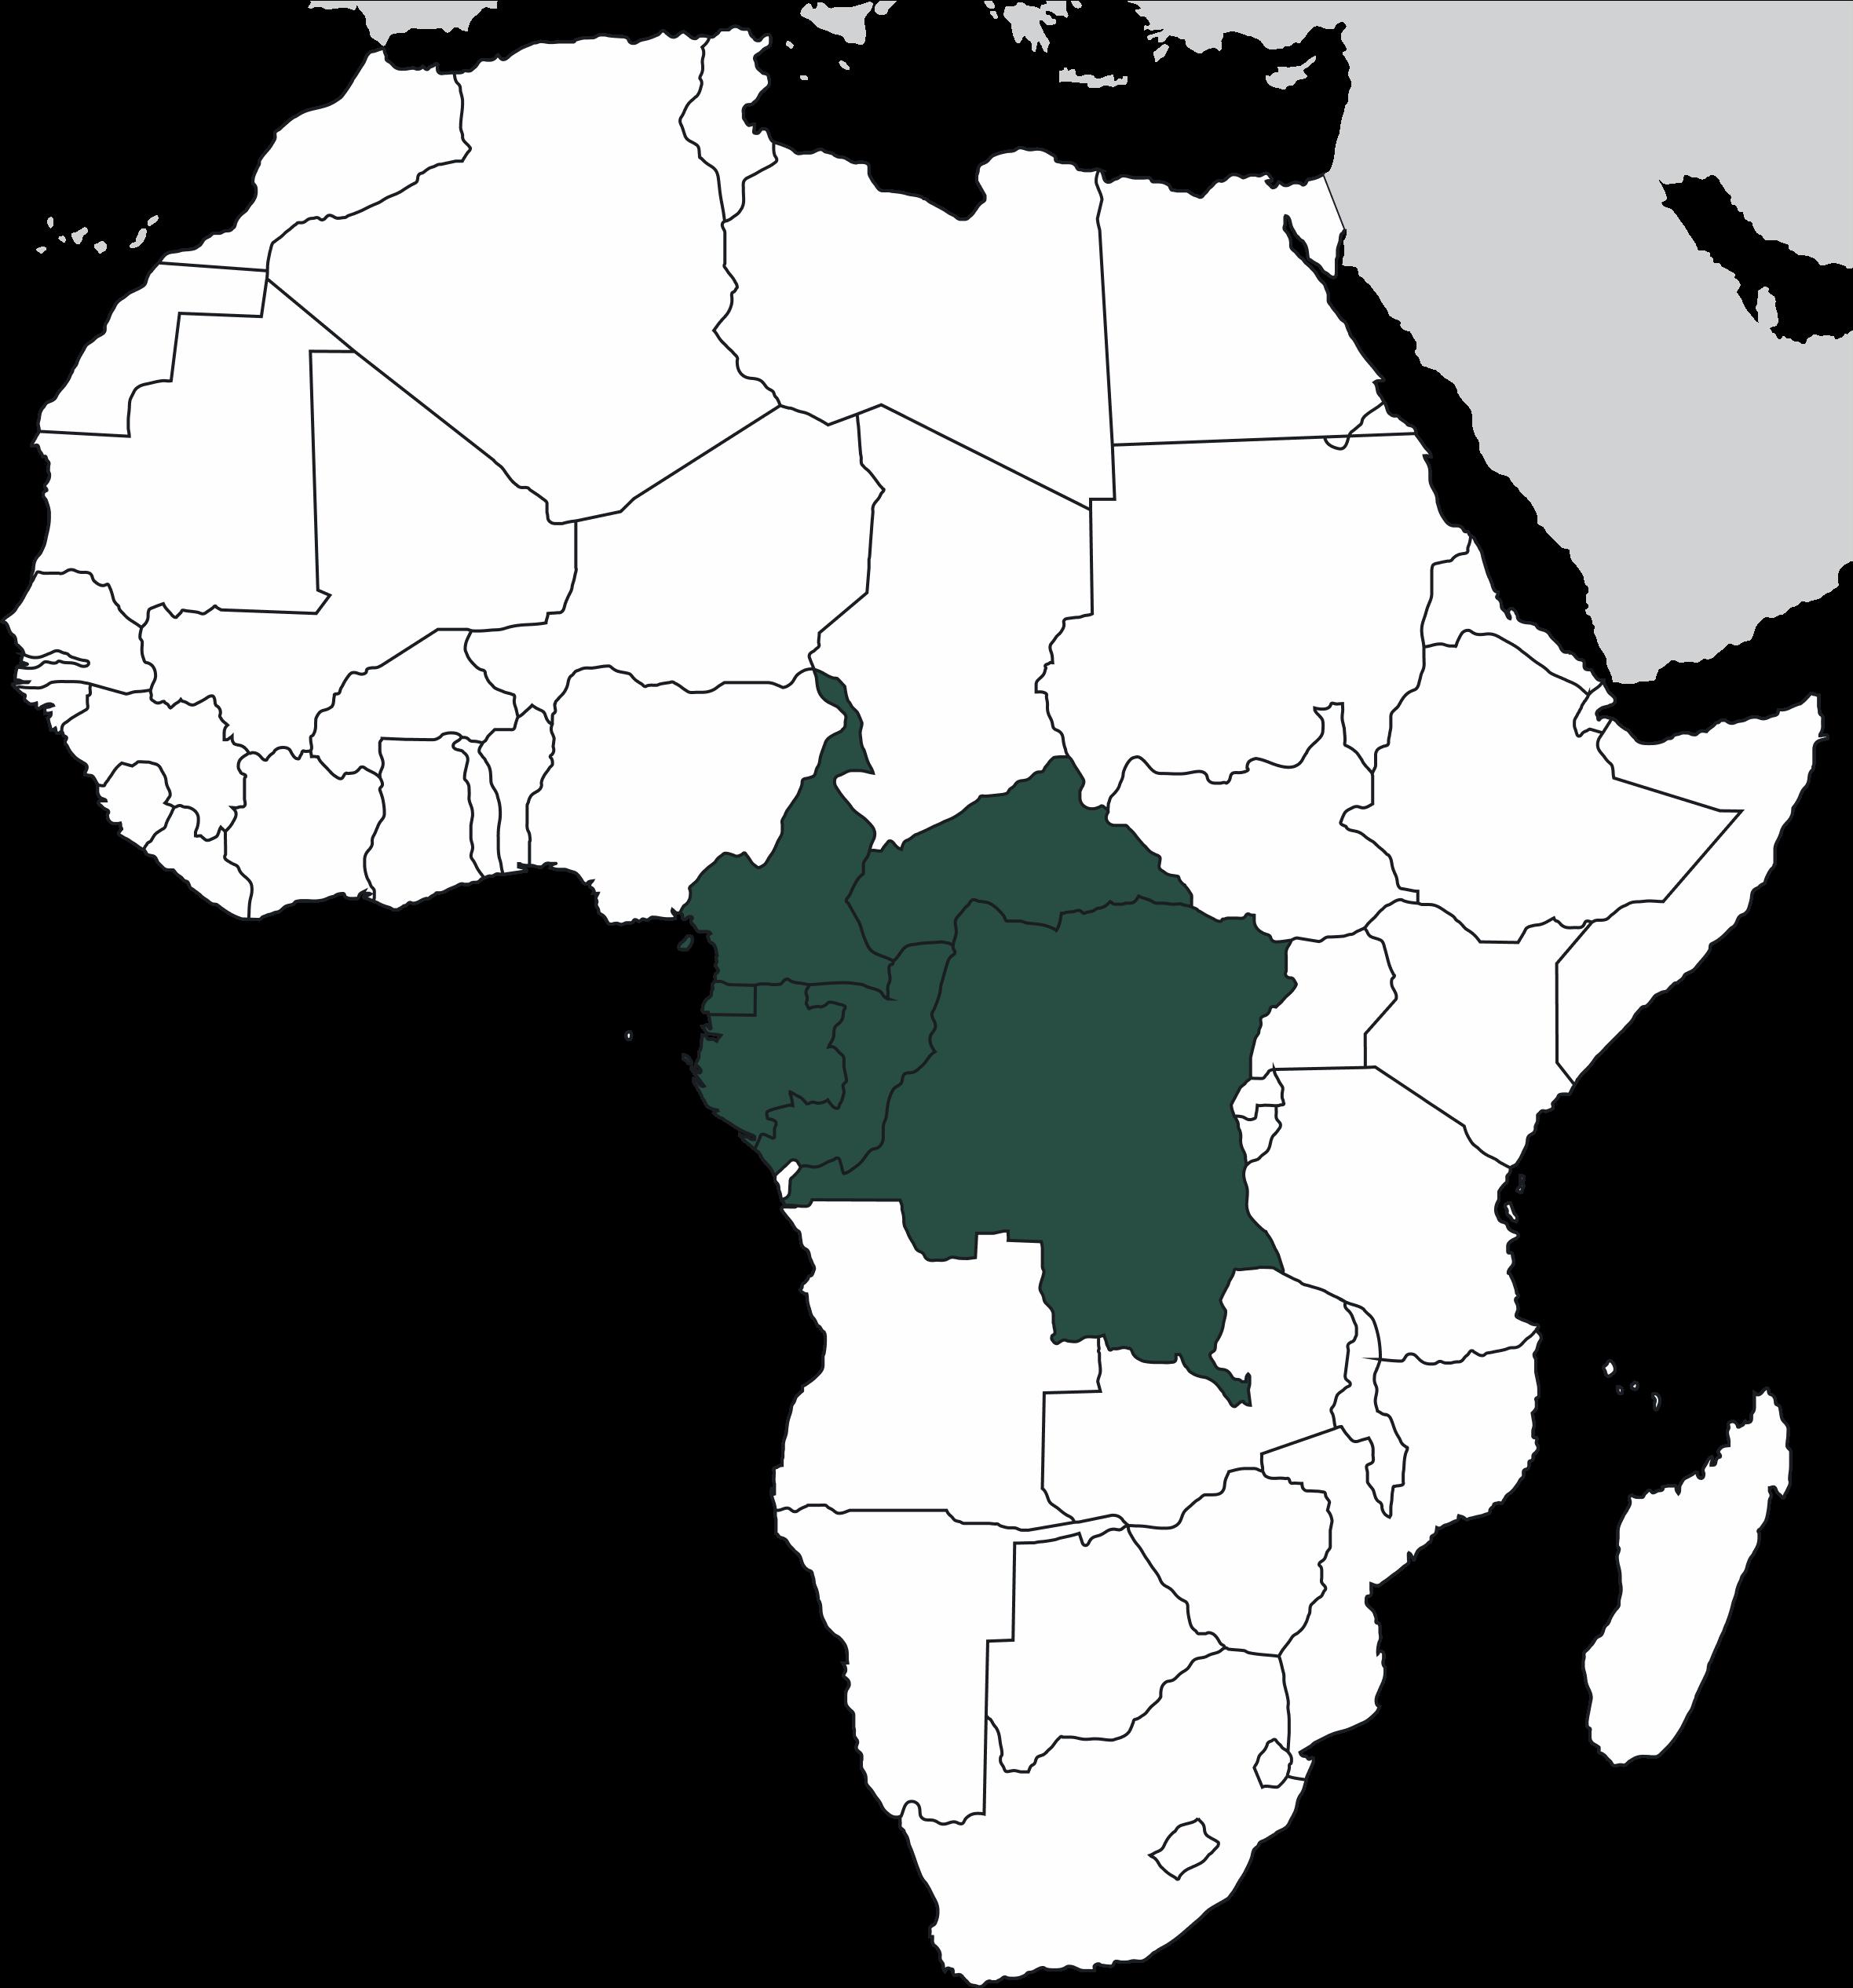 Map of Africa's Congo Basin Rainforest.